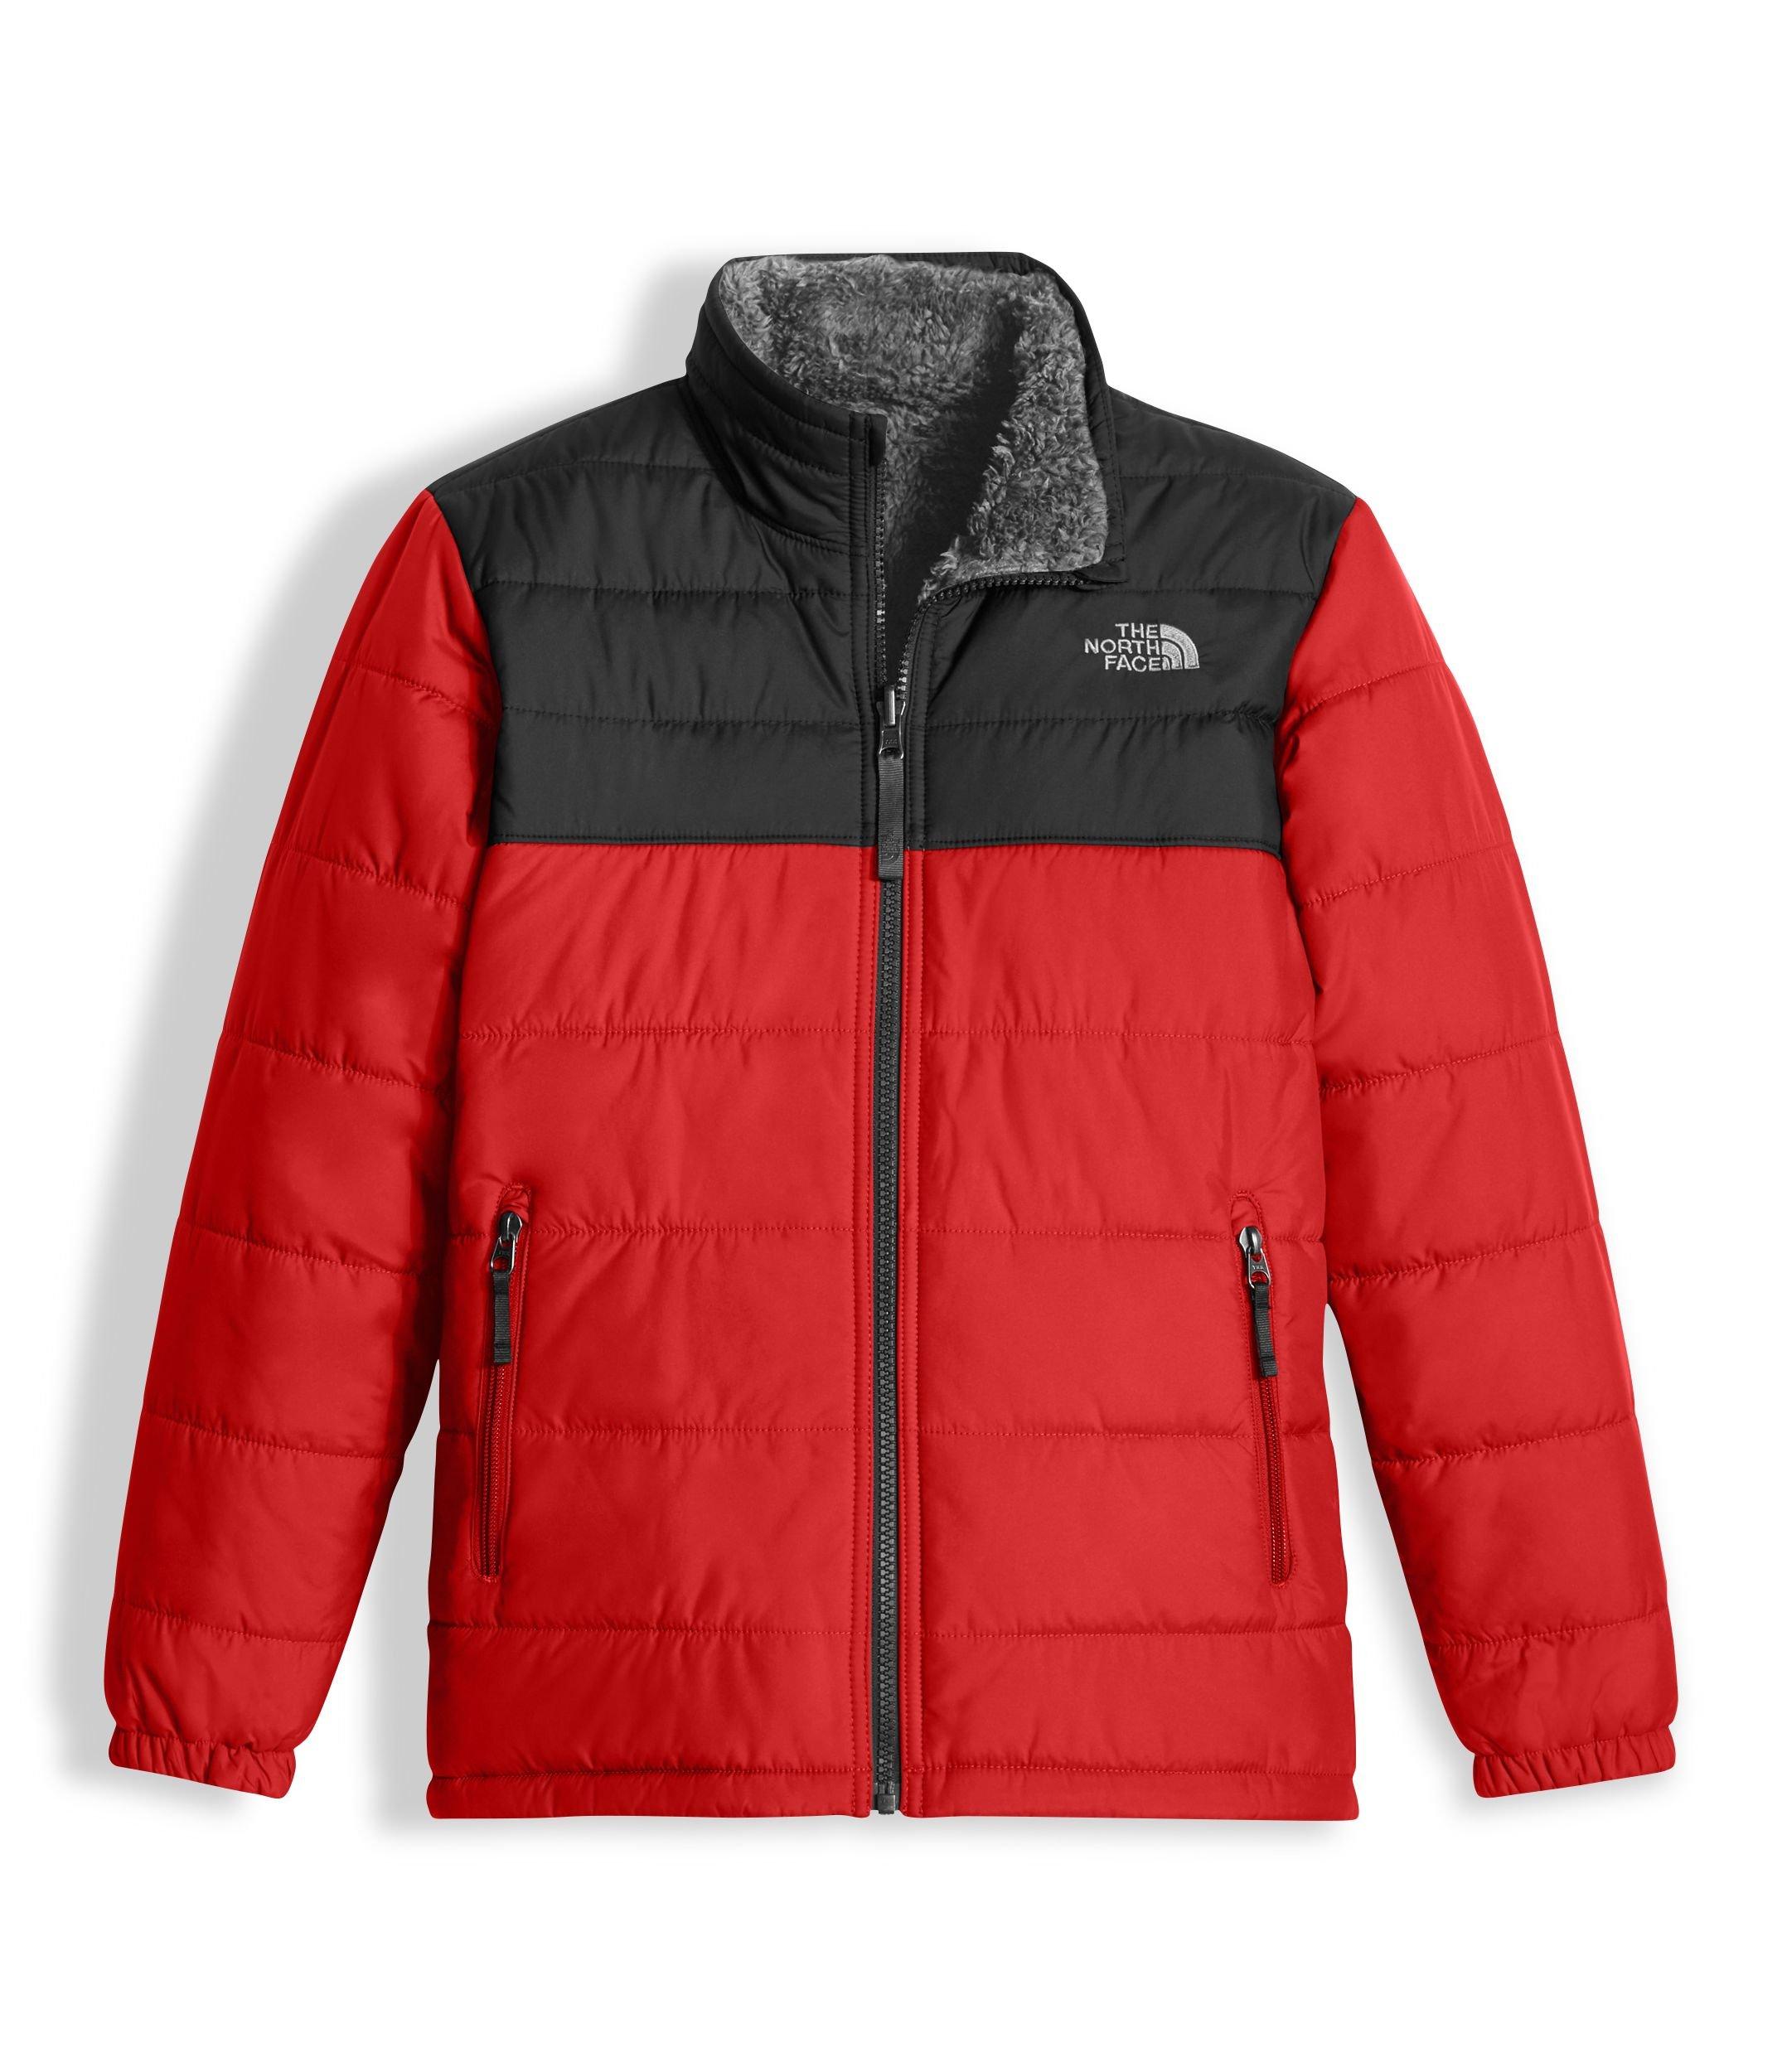 The North Face Kids Boy's Reversible Mount Chimborazo Jacket (Little Kids/Big Kids) TNF Red/TNF Black/TNF White X-Small